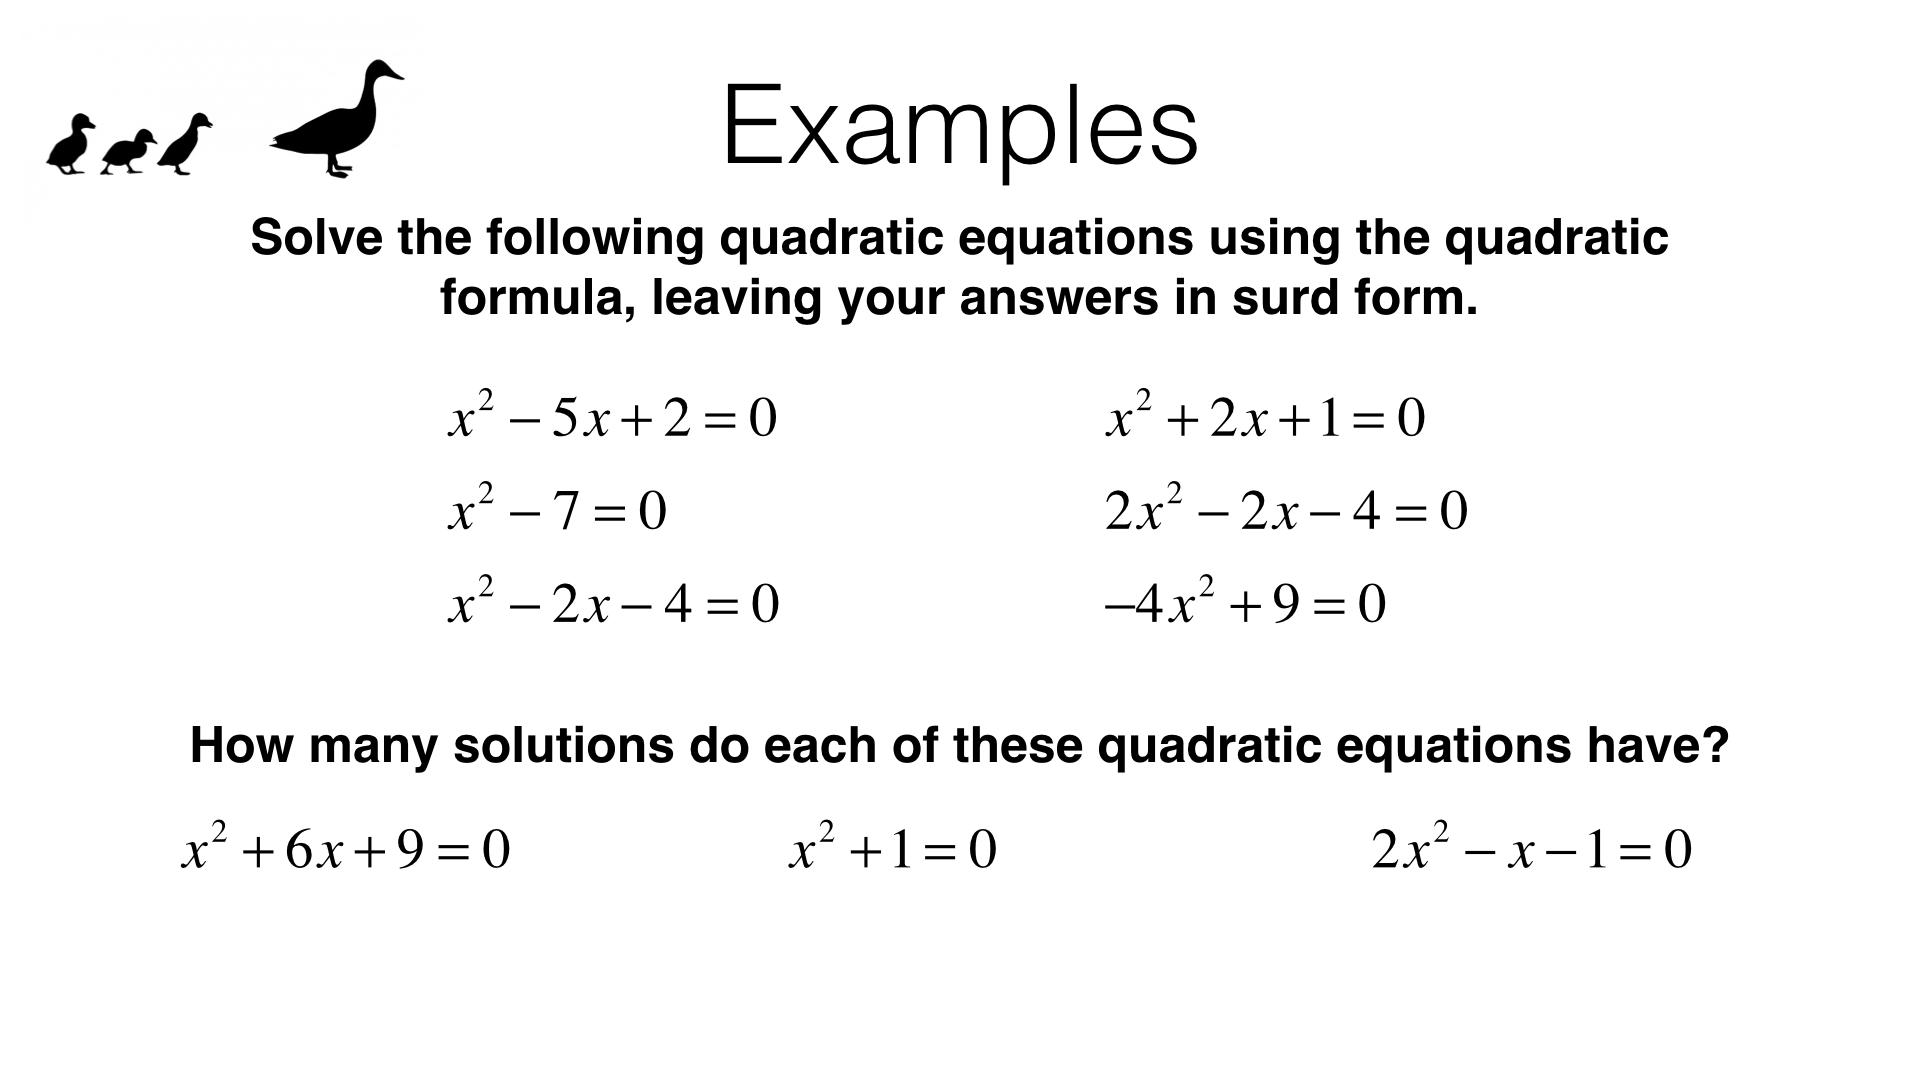 A18c Solving Quadratic Equations Using The Quadratic